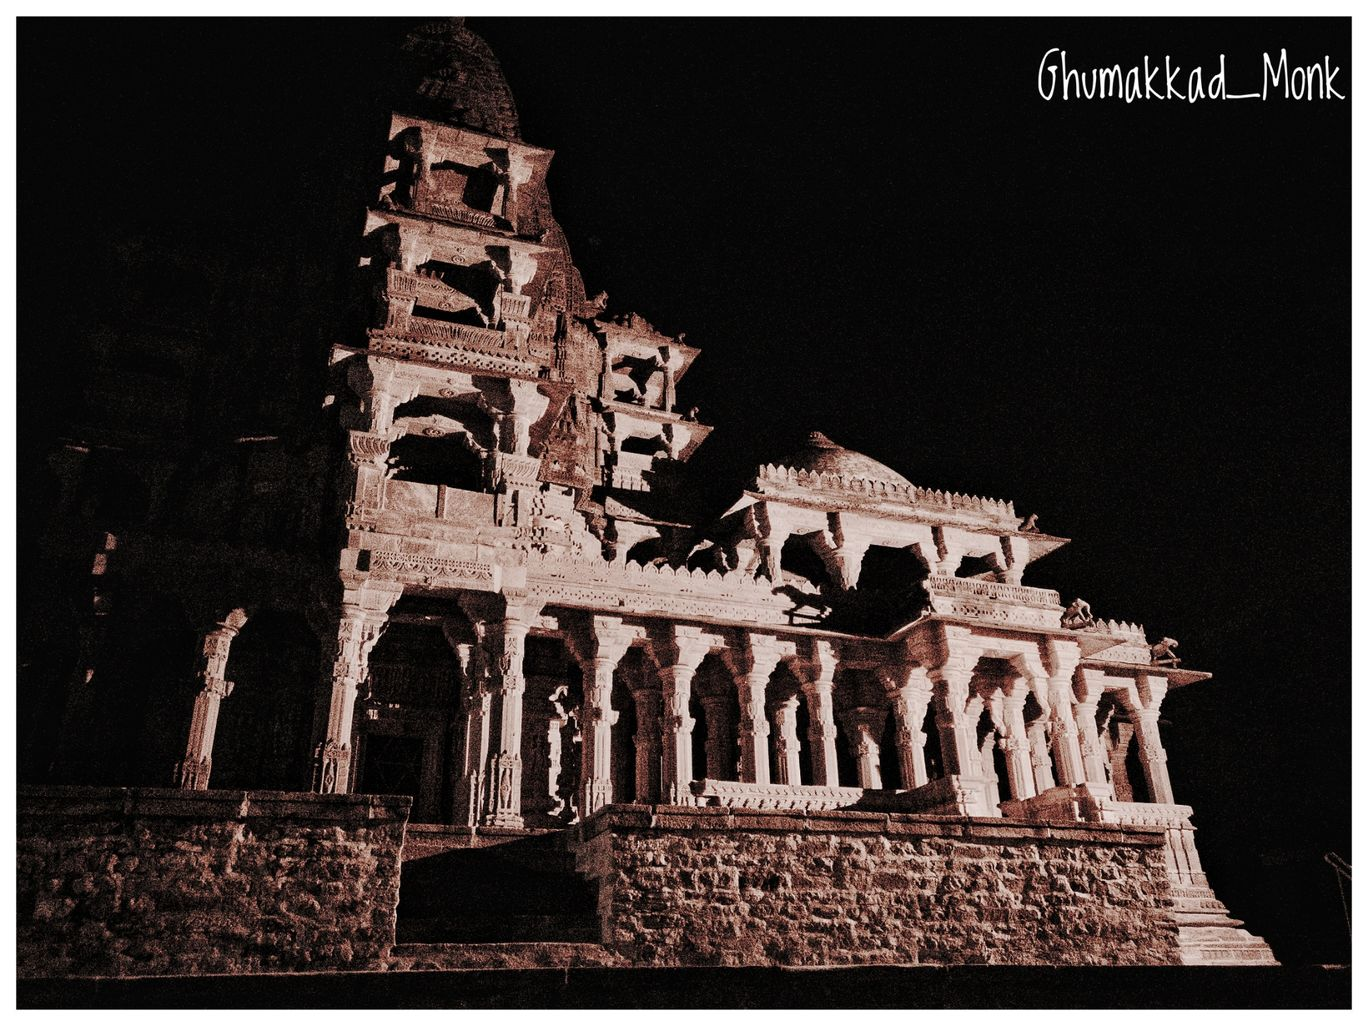 Photo of Pune By Ghumakkad_Monk